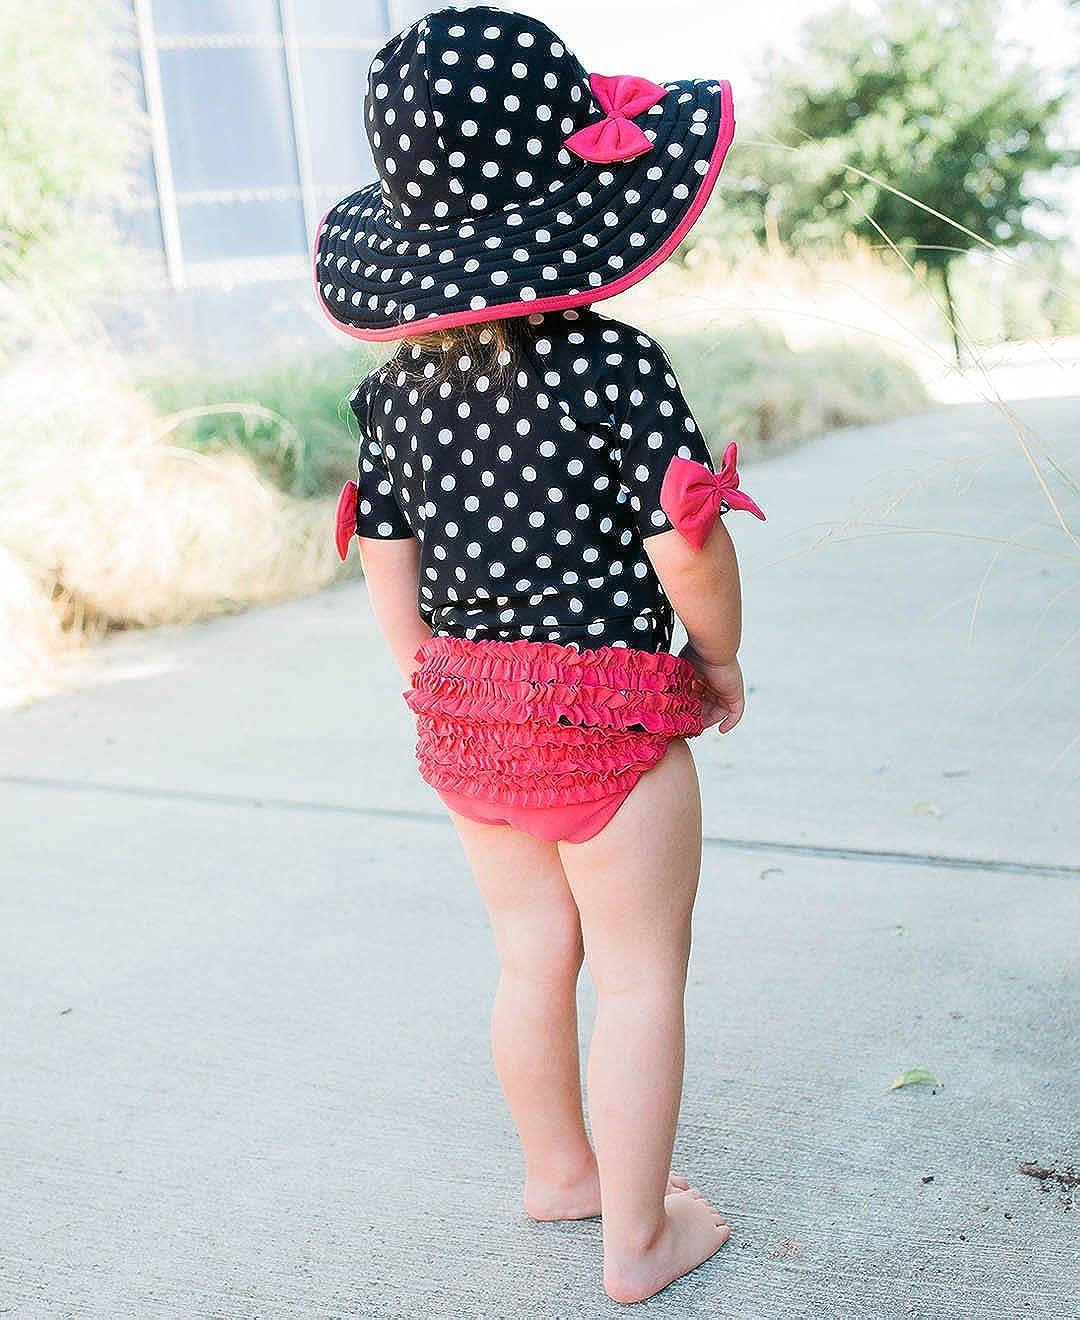 Sun Protection GSET2XX-SWIM-SC-TDLR RuffleButts Little Girls Short Sleeve Ruffled Rash Guard and Swim Hat Set UPF 50